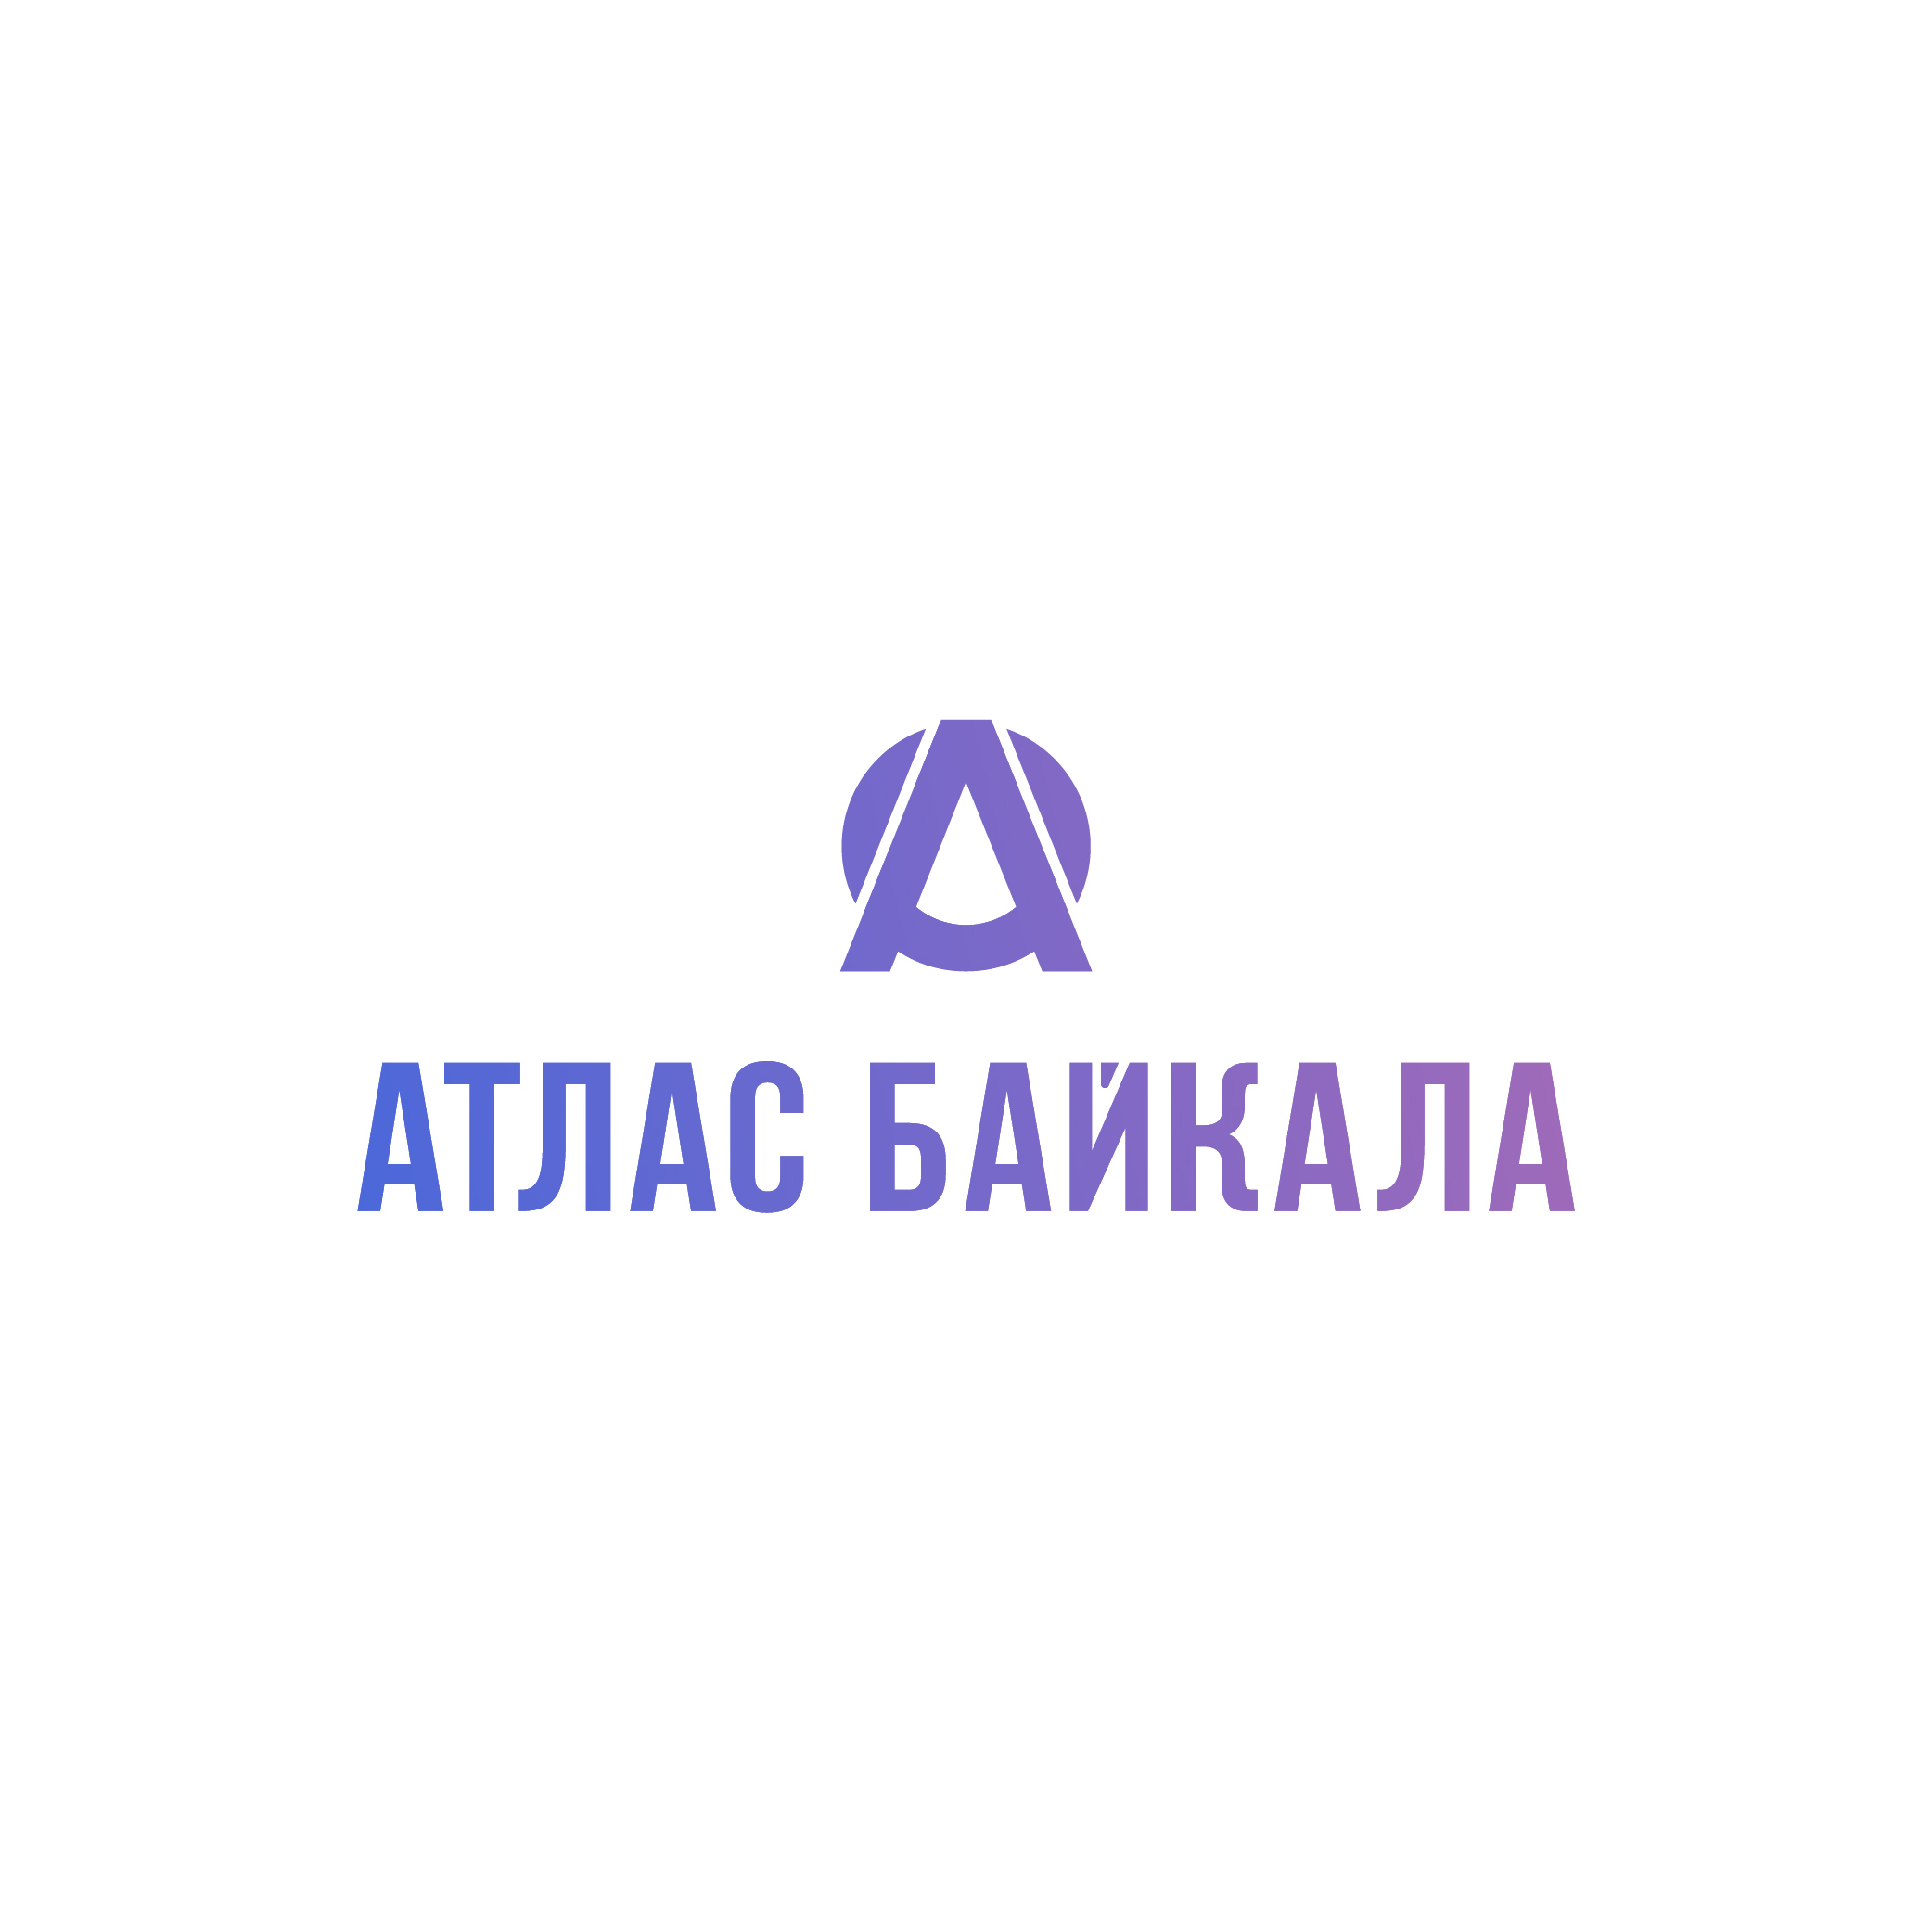 Разработка логотипа Атлас Байкала фото f_9615afc8d5143bd1.jpg